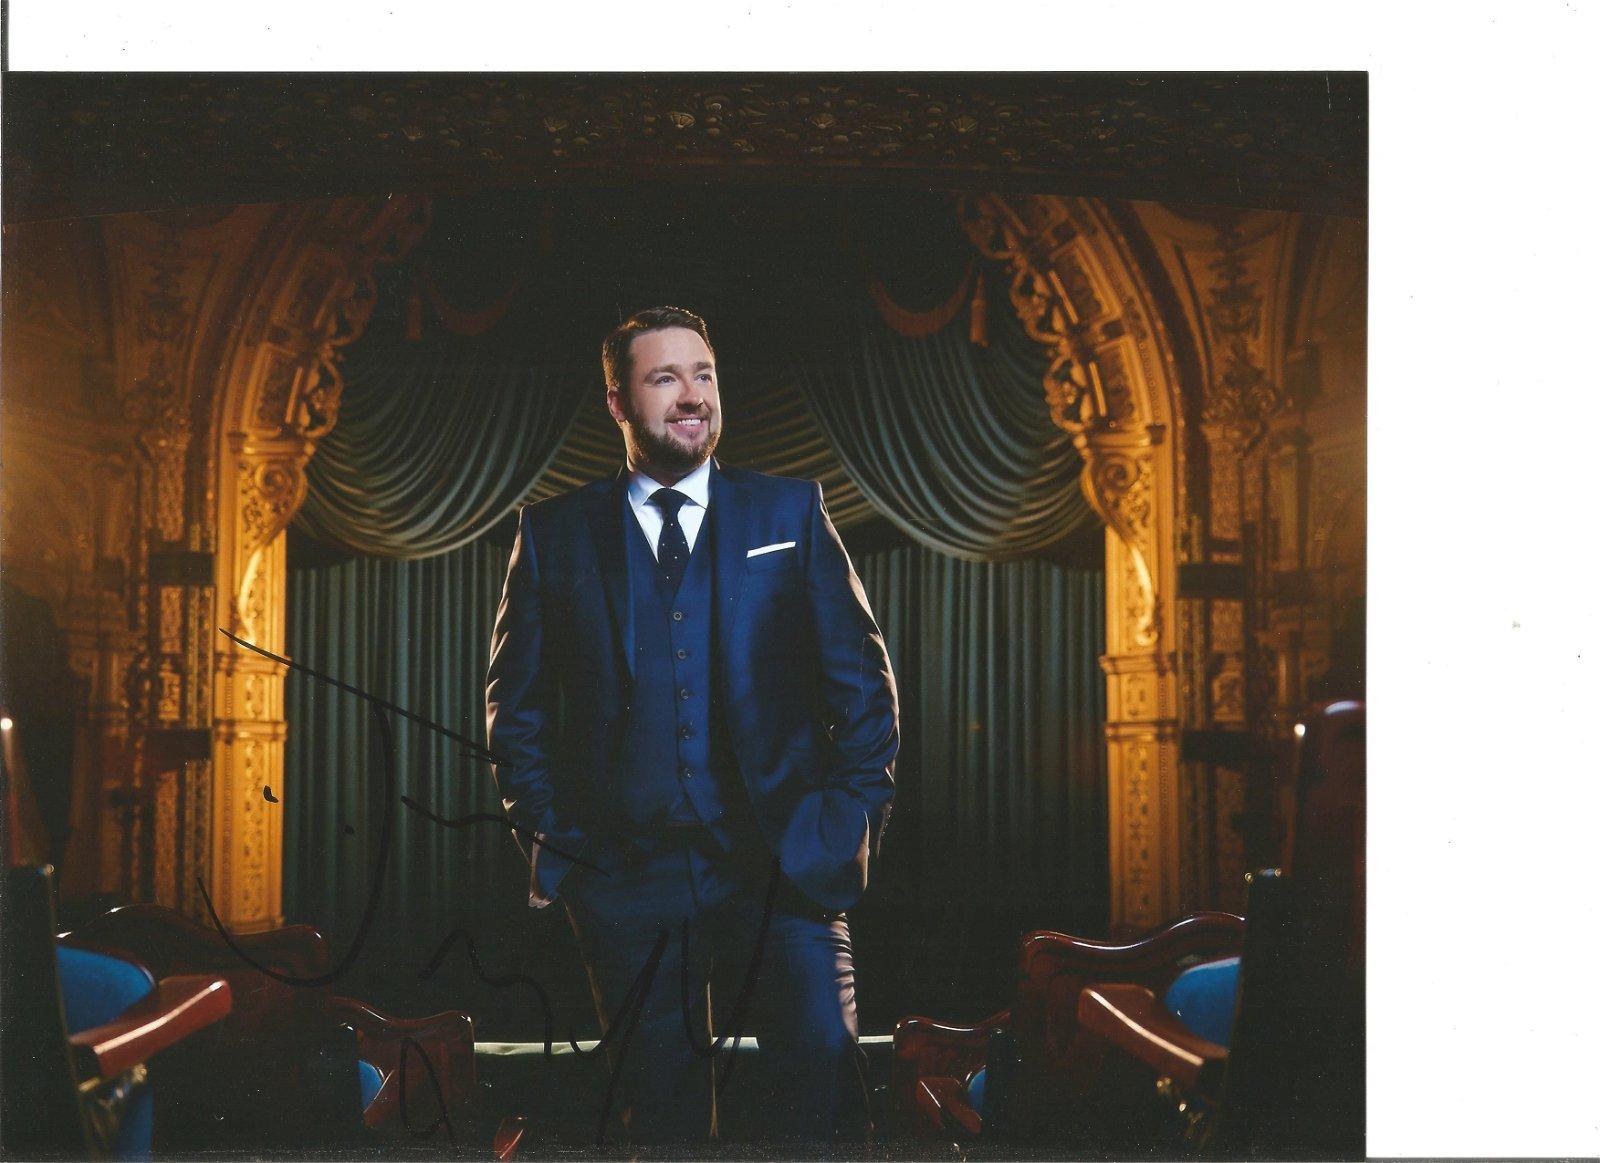 Jason Manford Actor Comedian Signed 8x10 Photo. Good